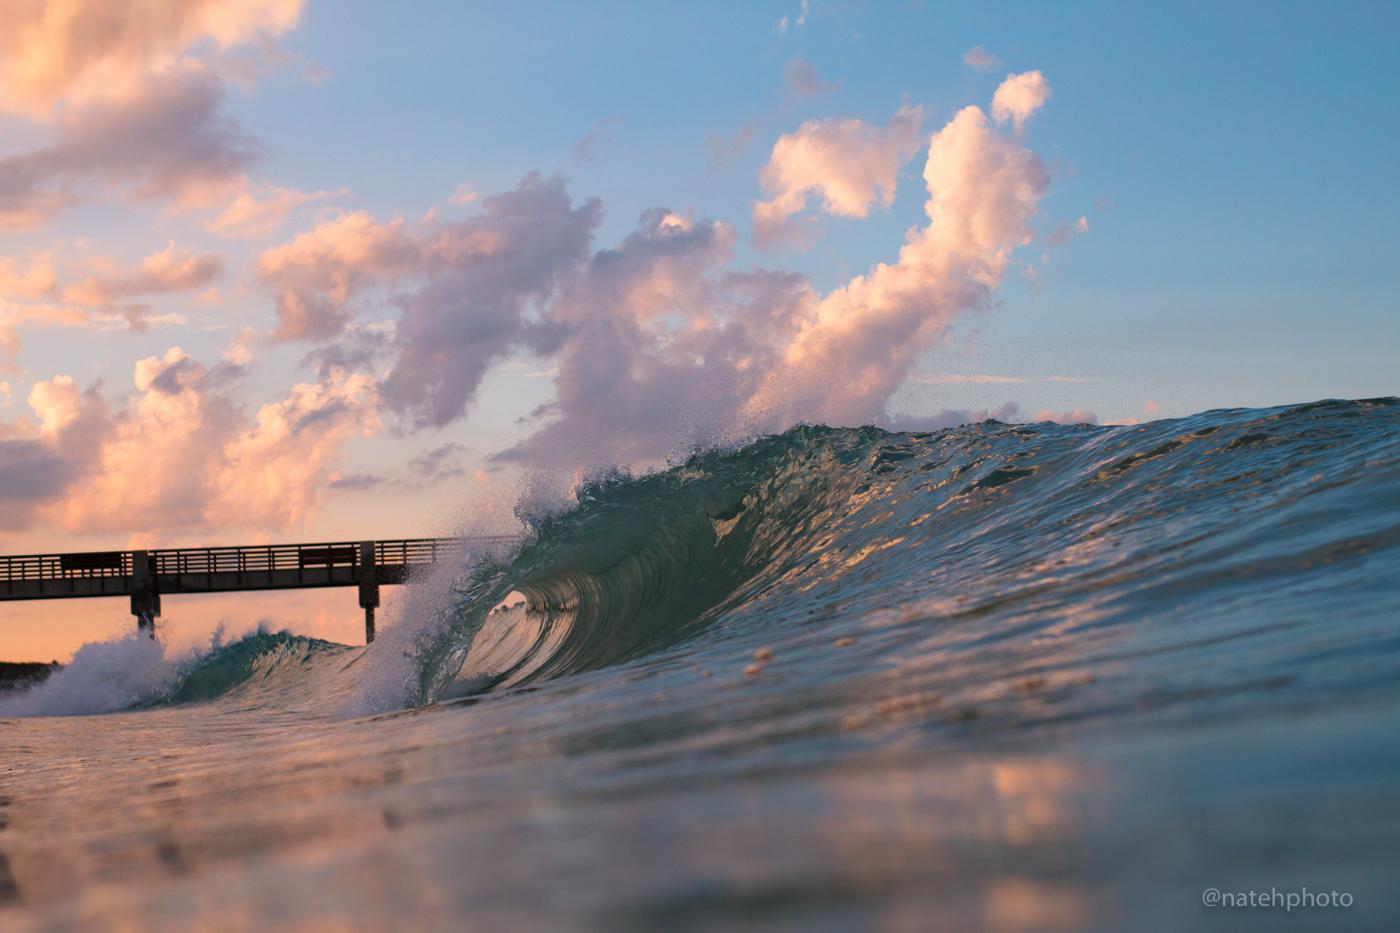 ElectricEvening_VeroBeach_Florida_natehphoto-9921.jpg